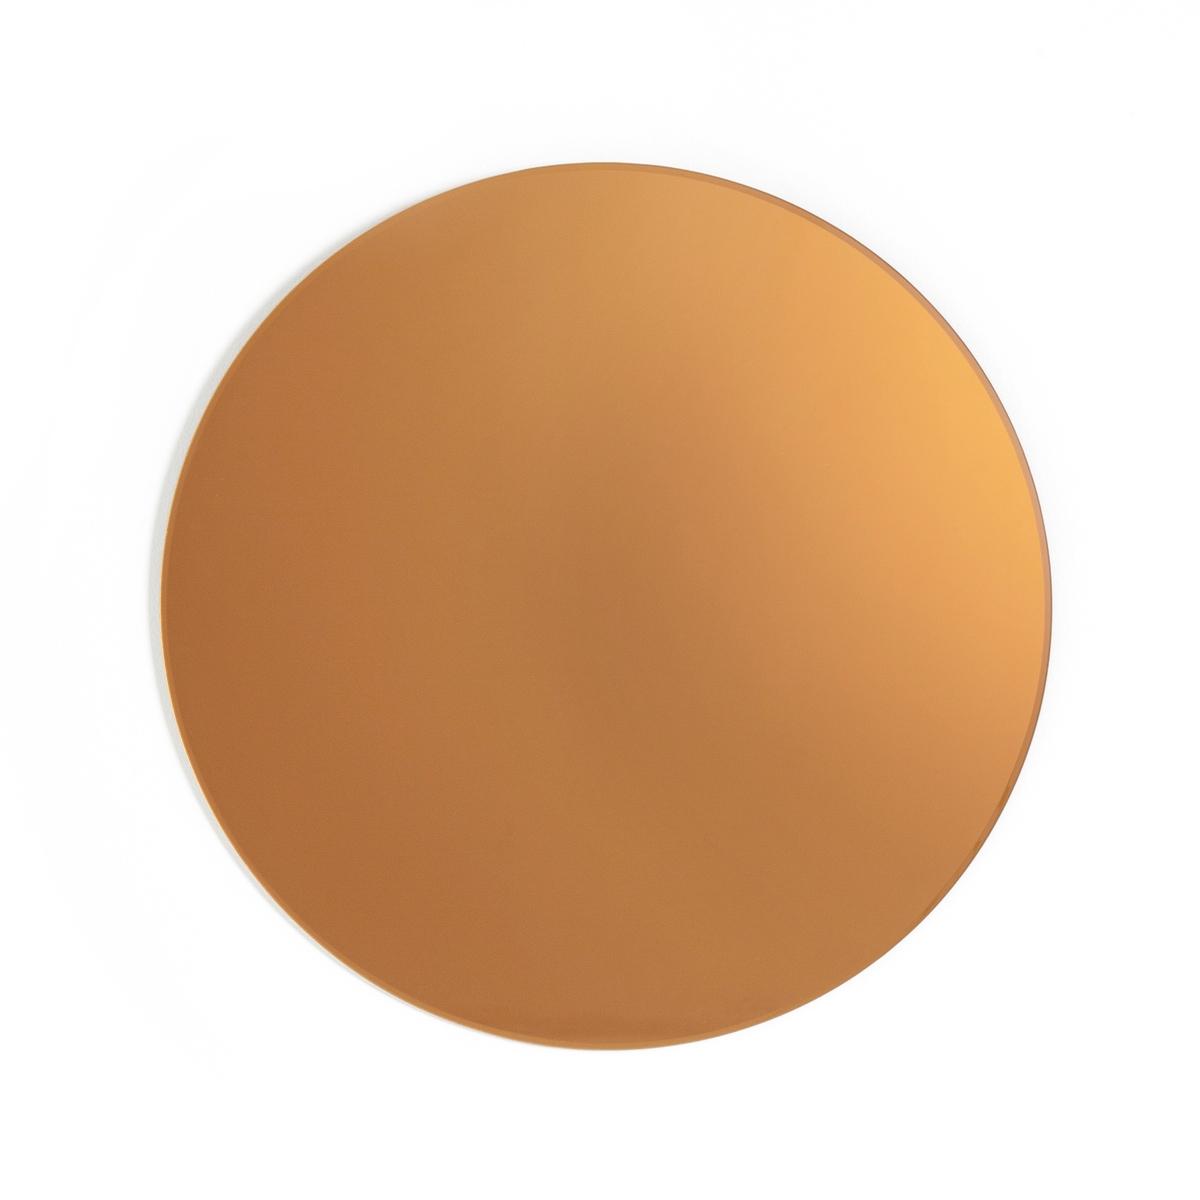 Зеркало круглое REDAM зеркало круглое ø60 см